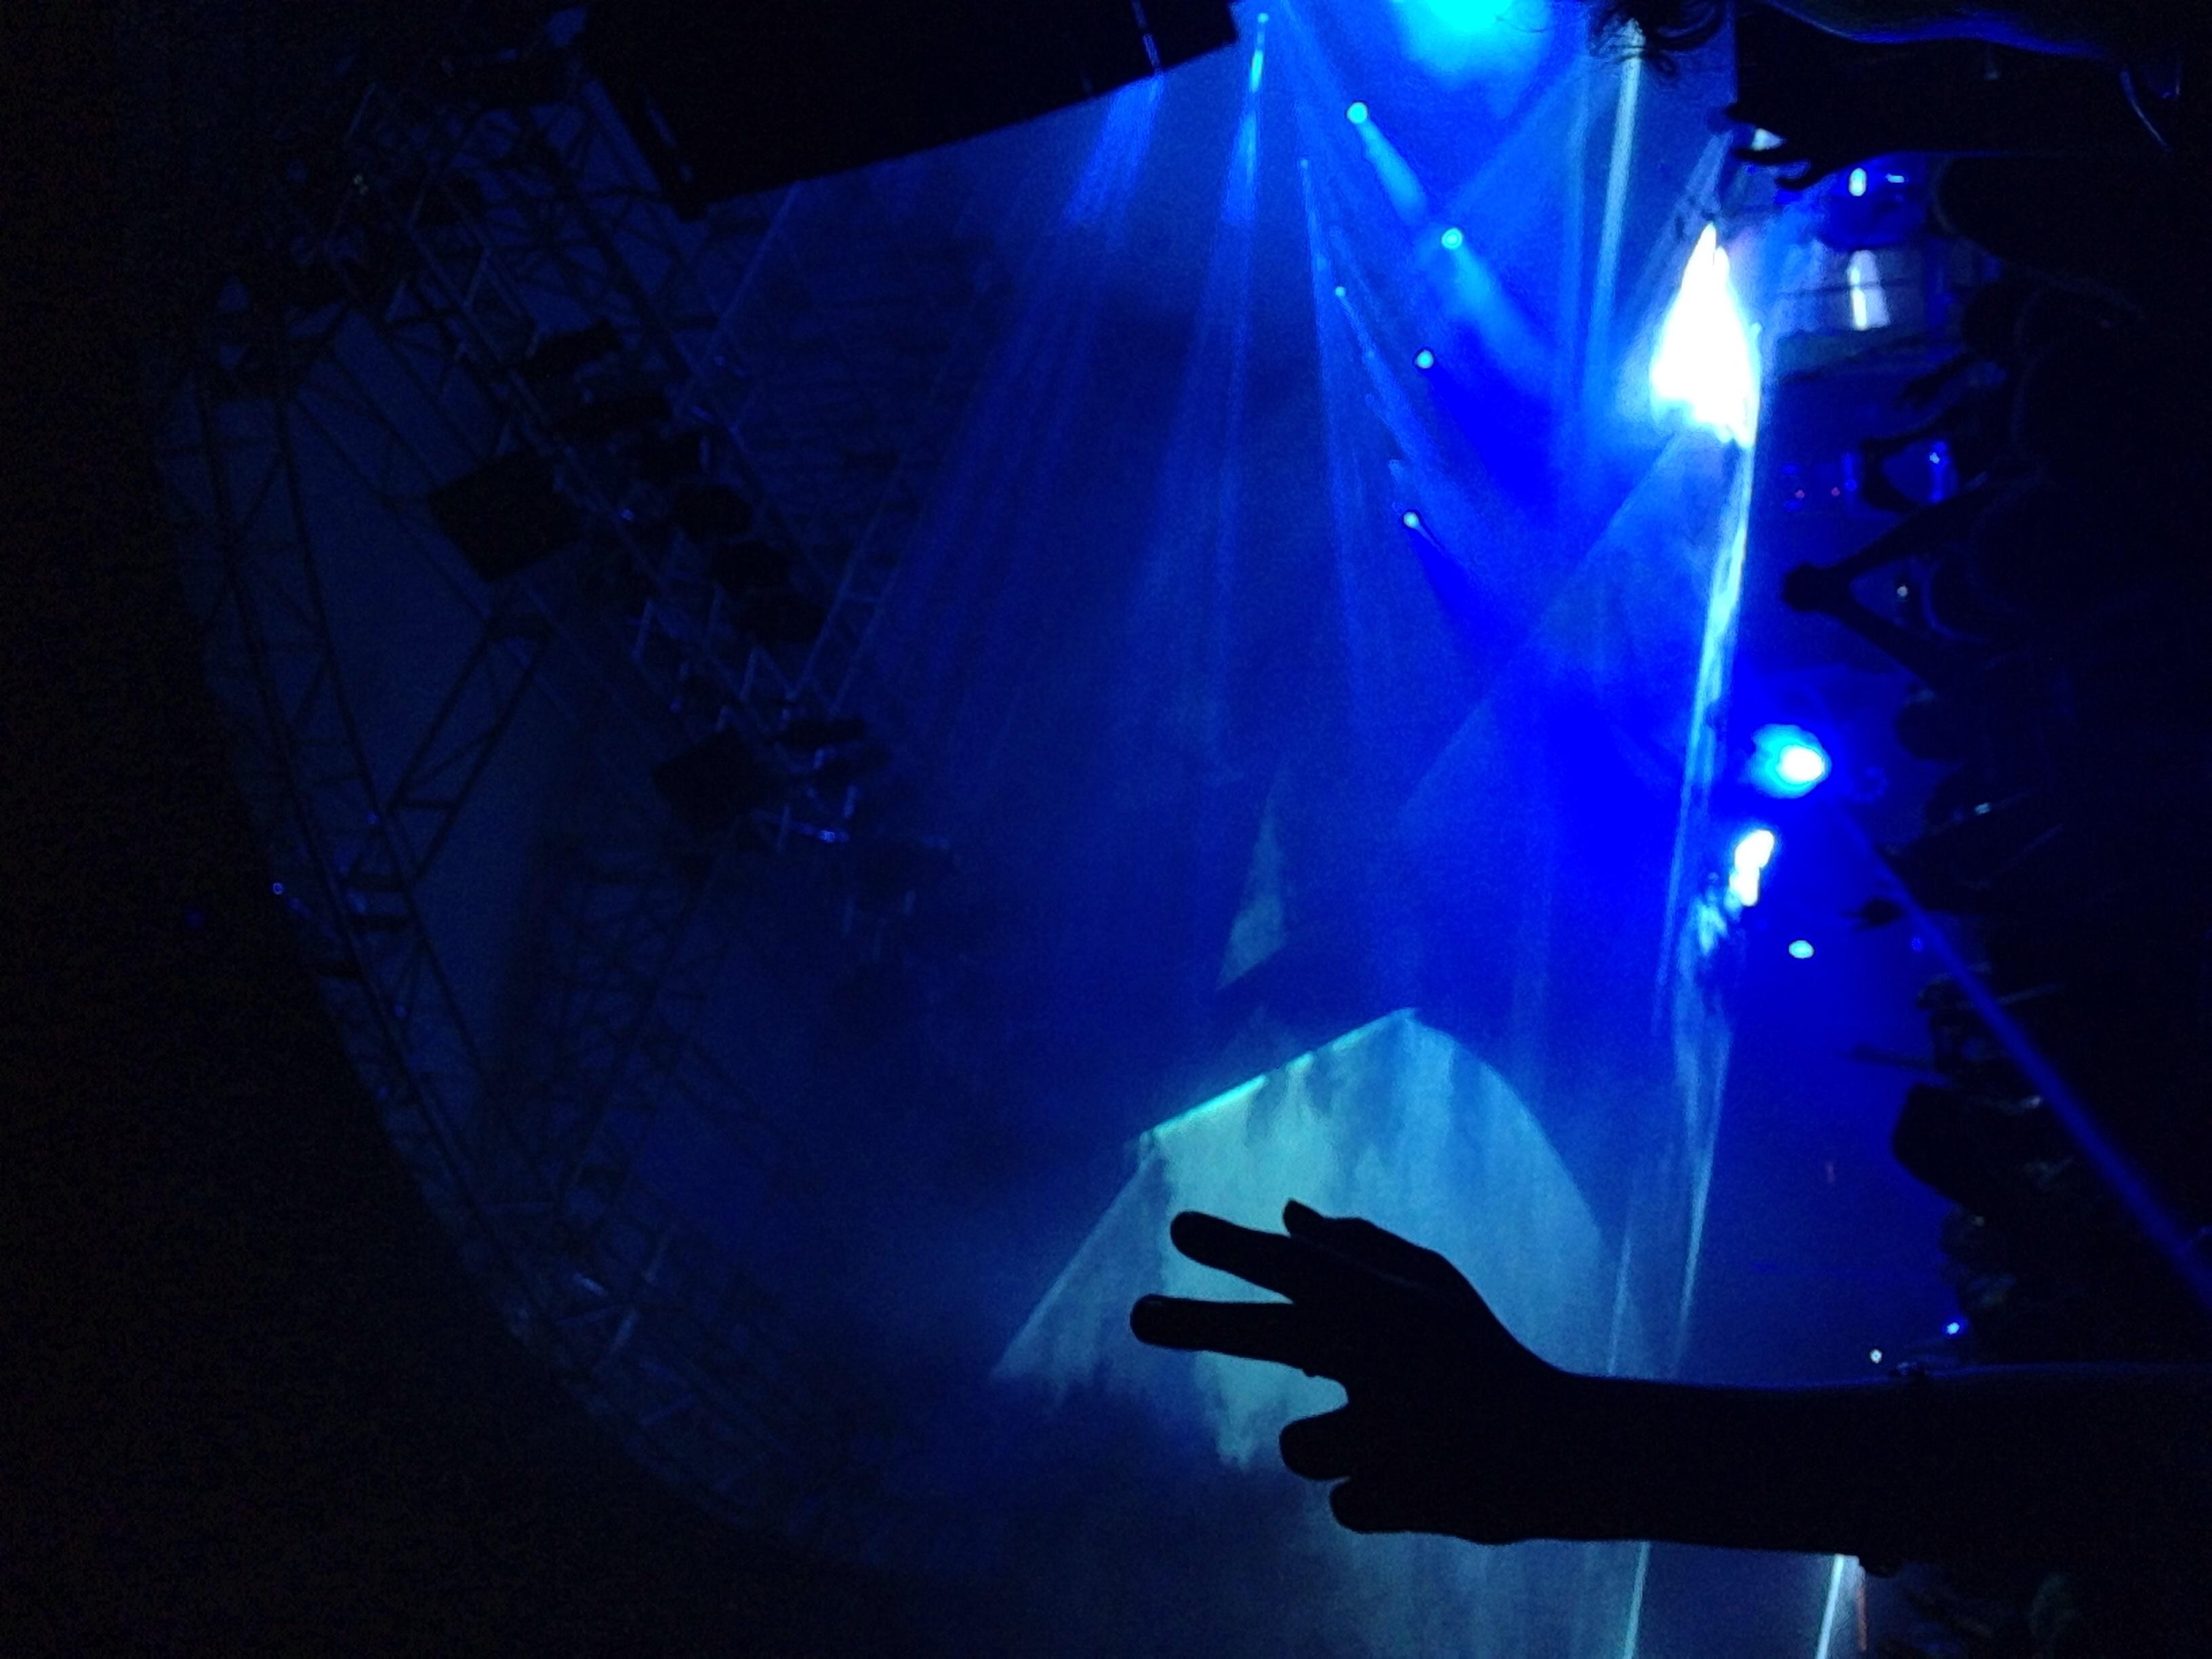 Portugal. The Man light show